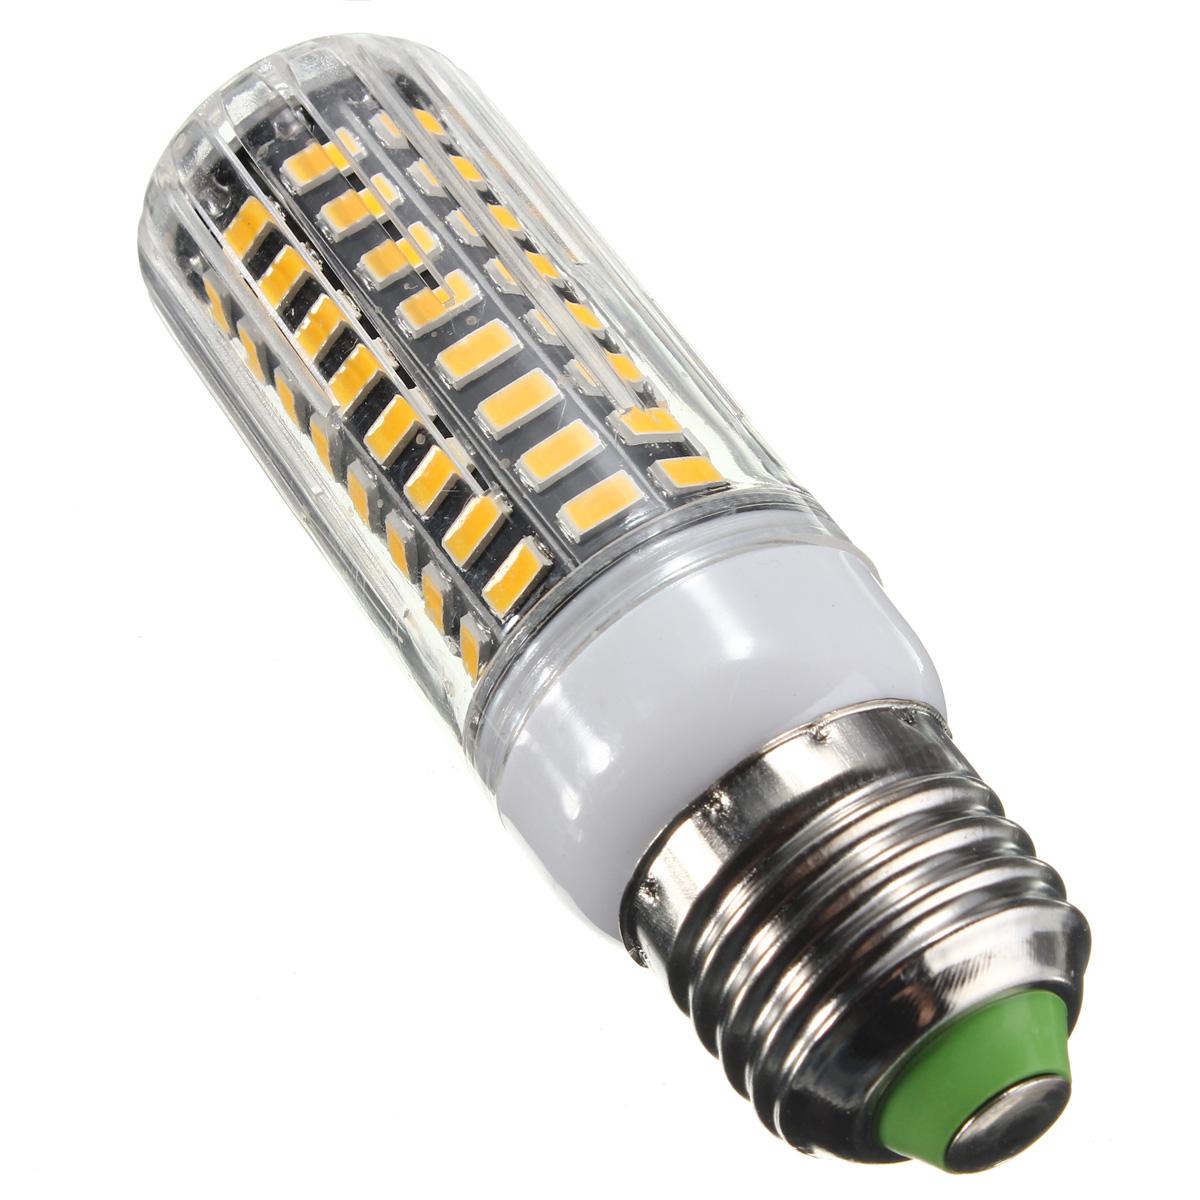 Broken Energy Efficient Light Bulb